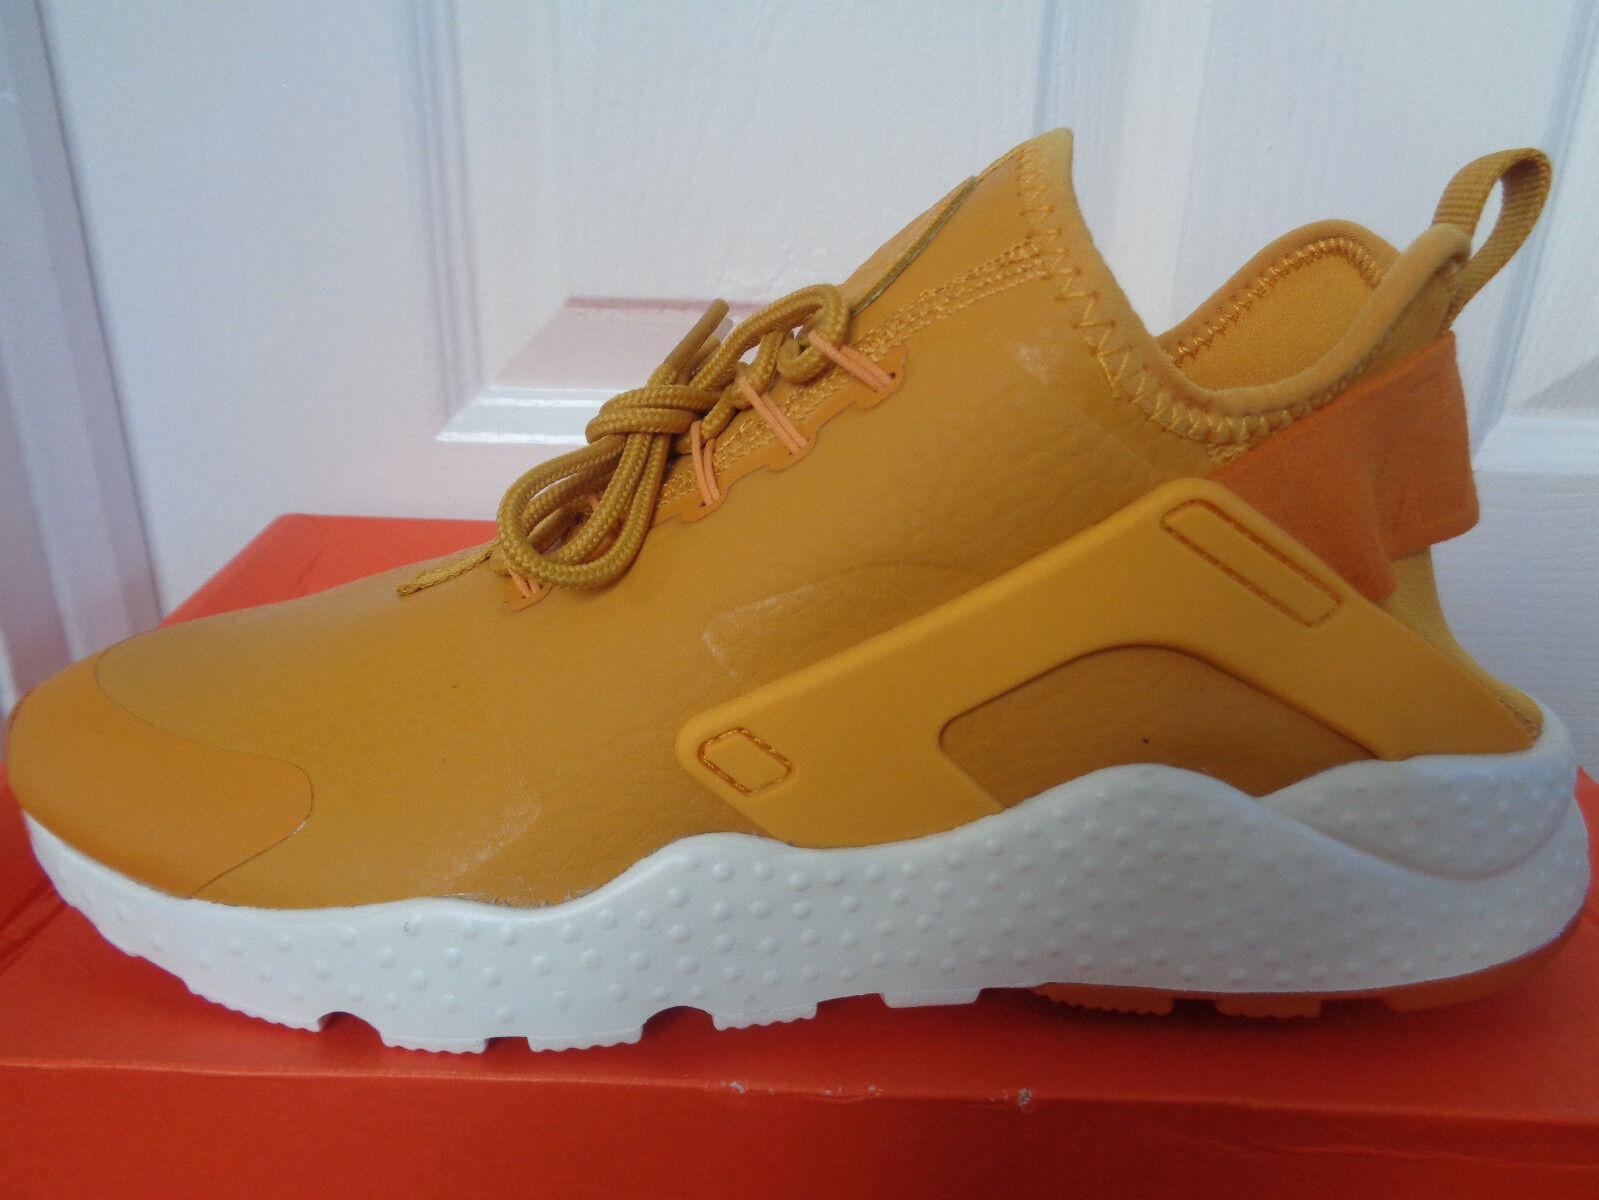 Nike Air huarache Run Ultra PRM trainers 859511 700 uk 7 eu 41 us 9.5 NEW+BOX